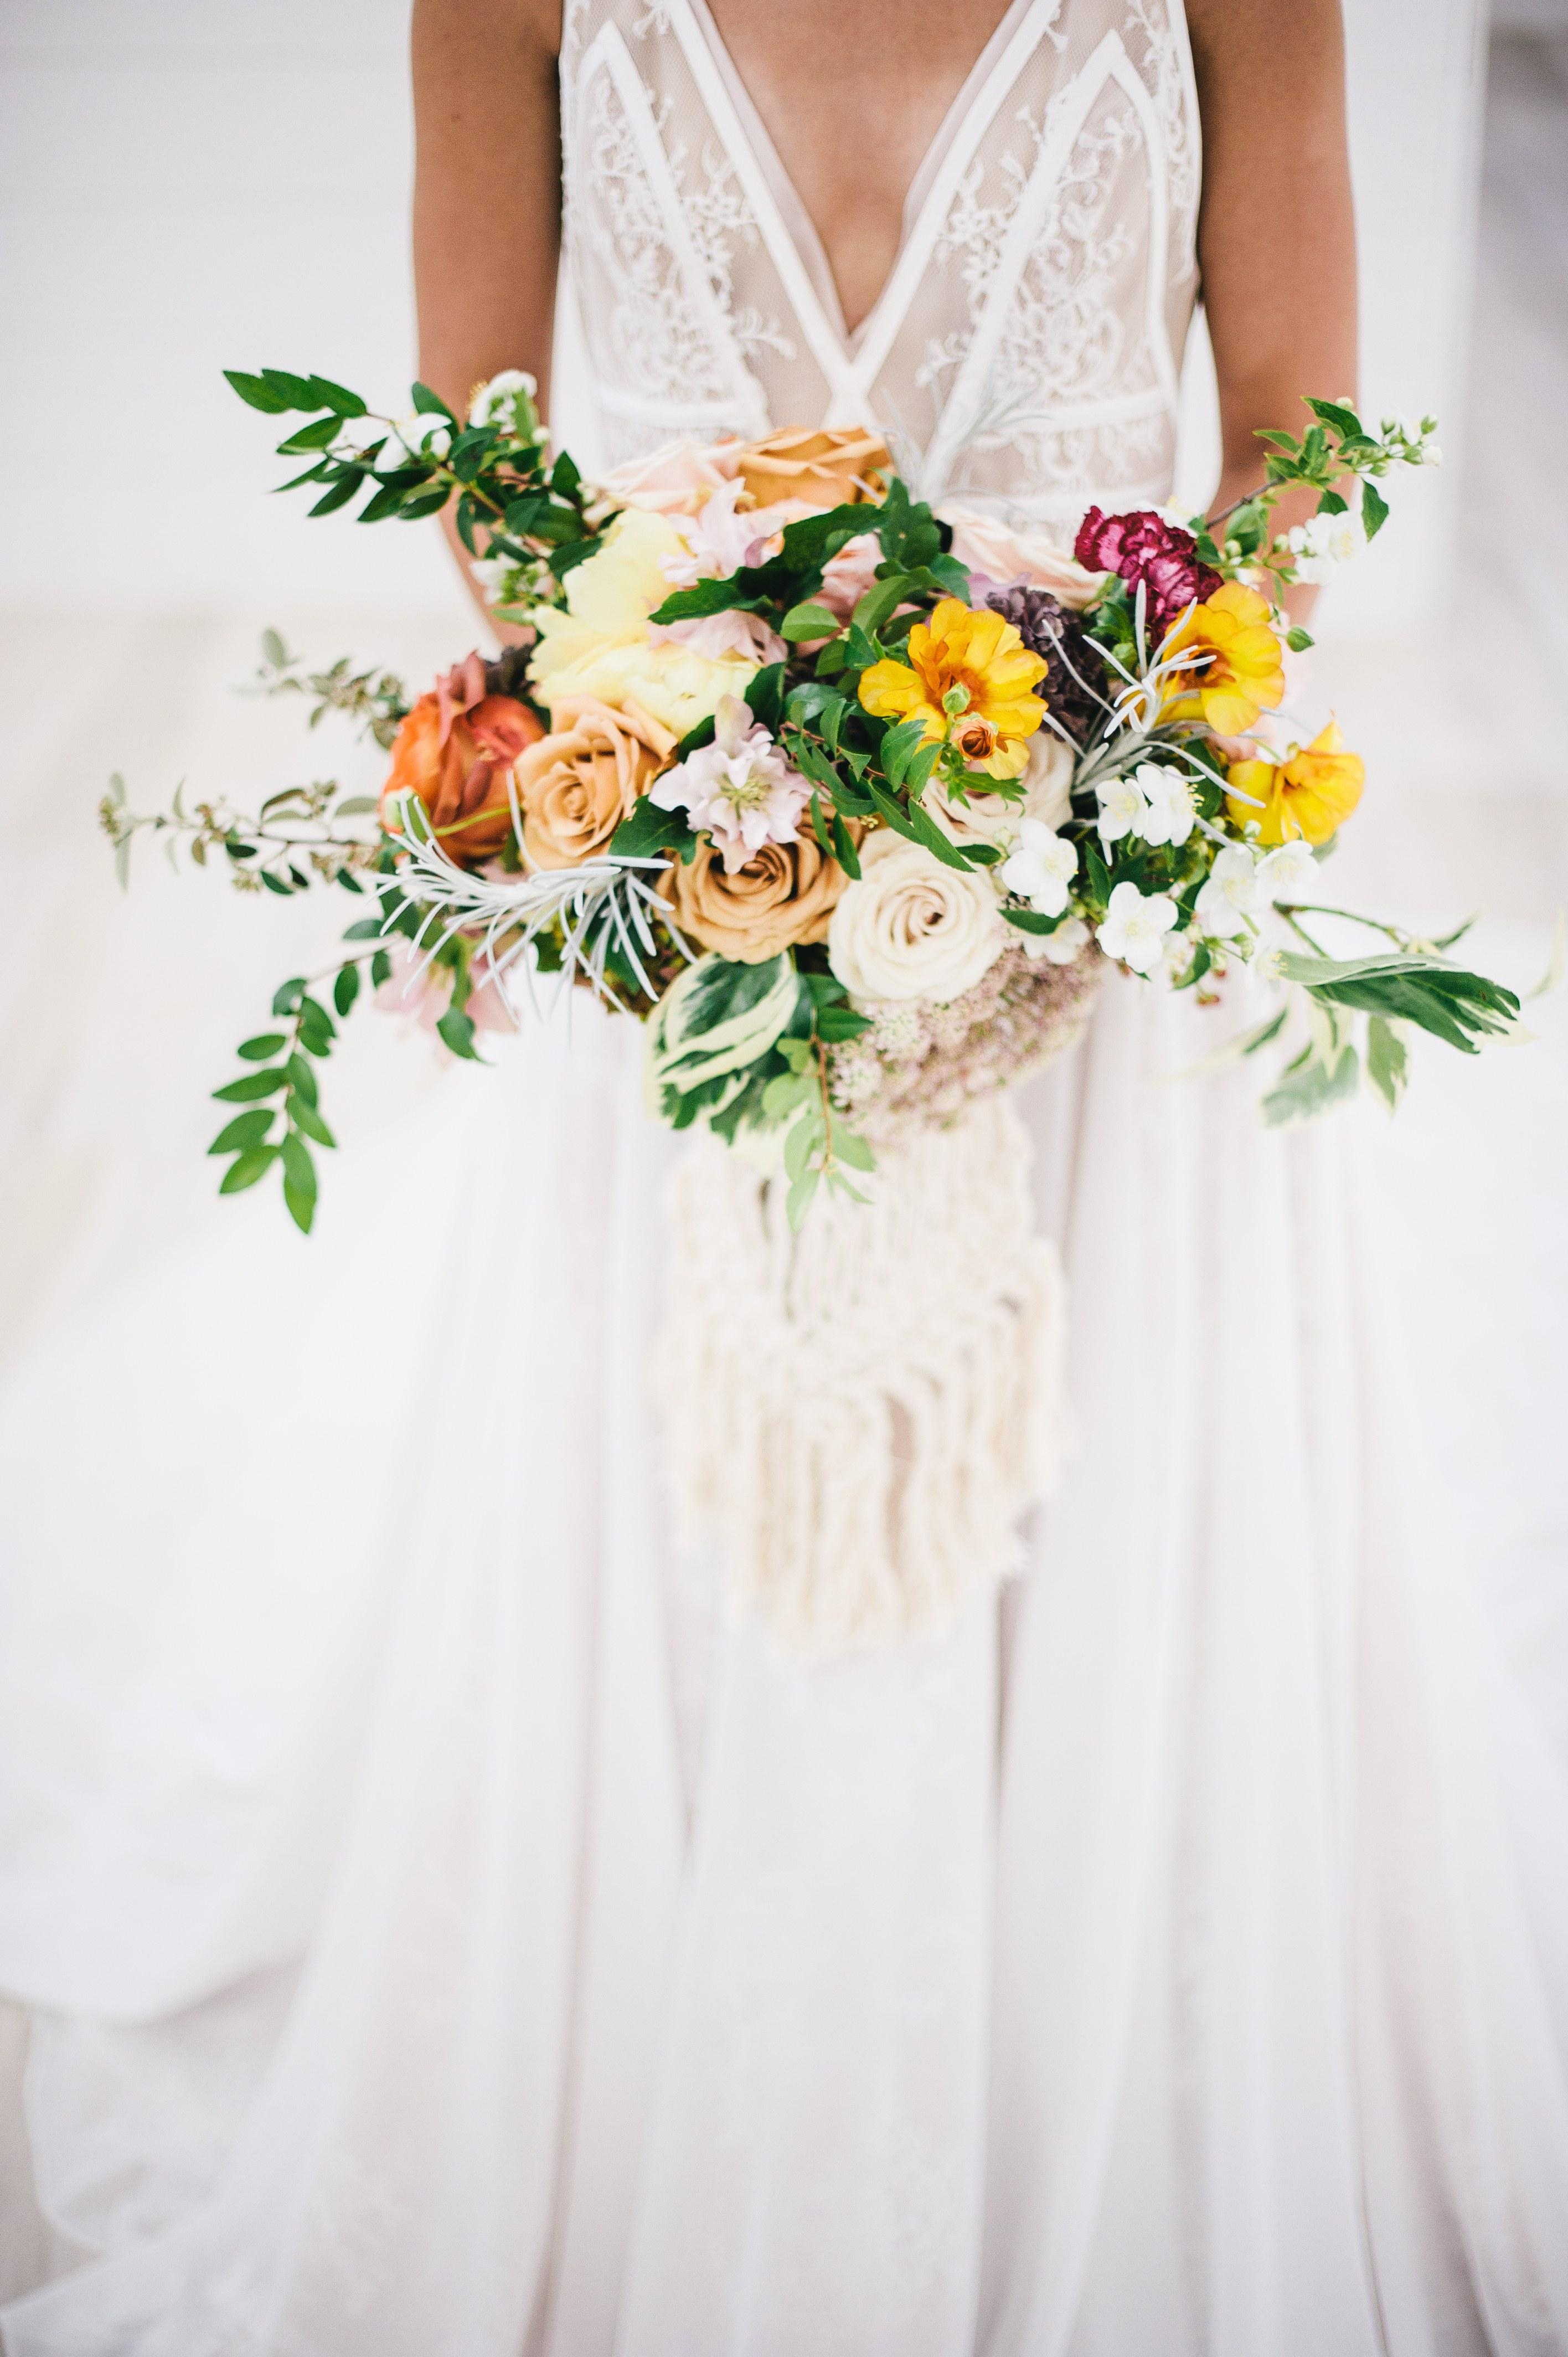 Bentuk Kebaya Bridesmaid Hijab Modern Tqd3 A Fall Bohemian Inspired Styled Shoot with Treasured Heart